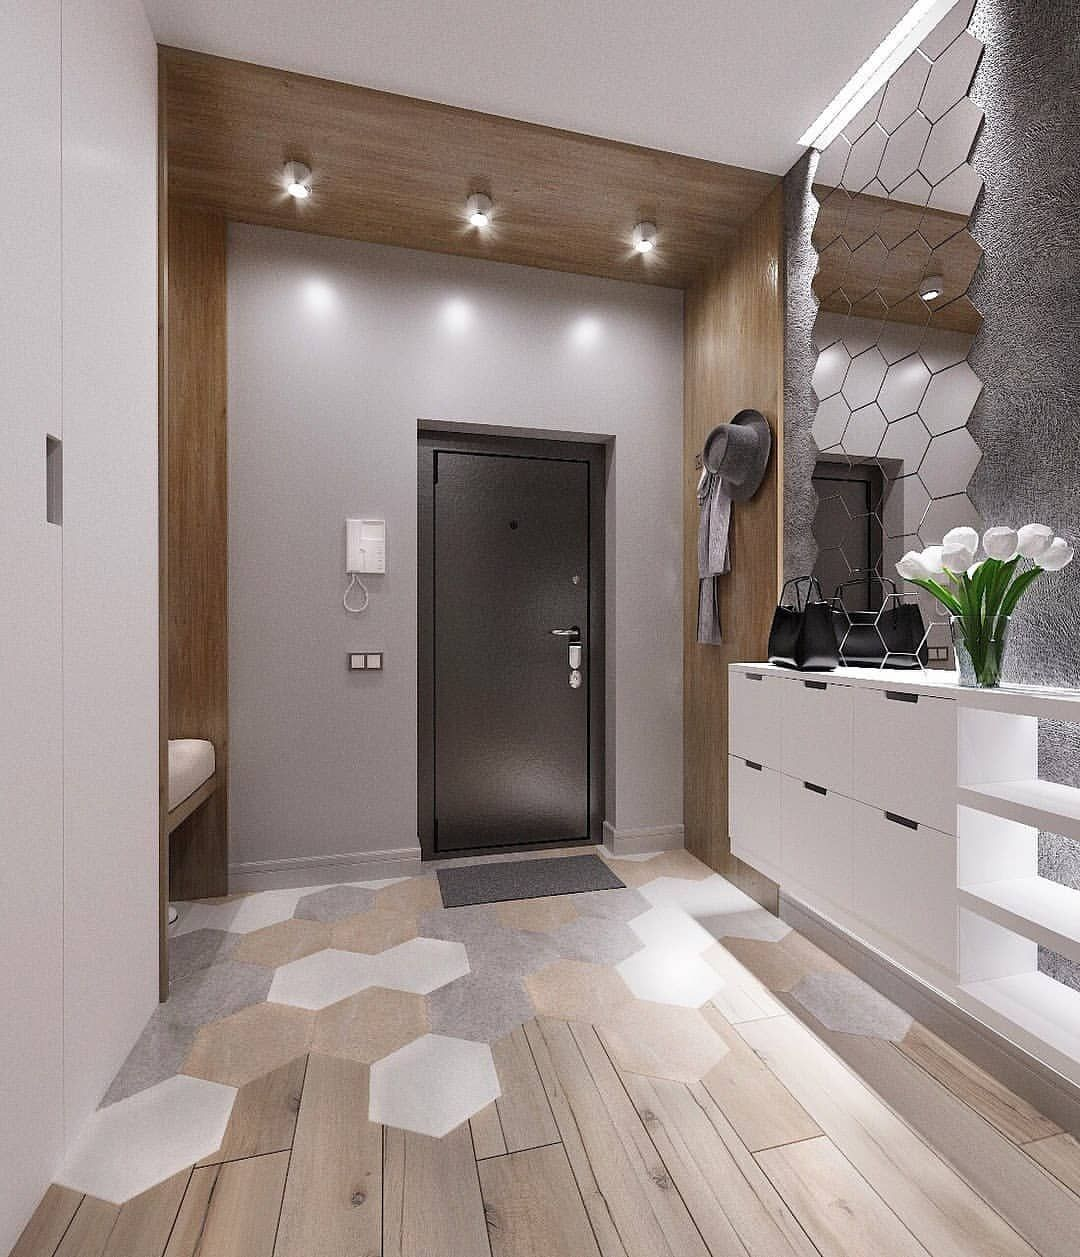 dom tvoej mechty alexandra lyubimenko also interiordesign interiordesignideas hallway hallwayideas decor rh pinterest